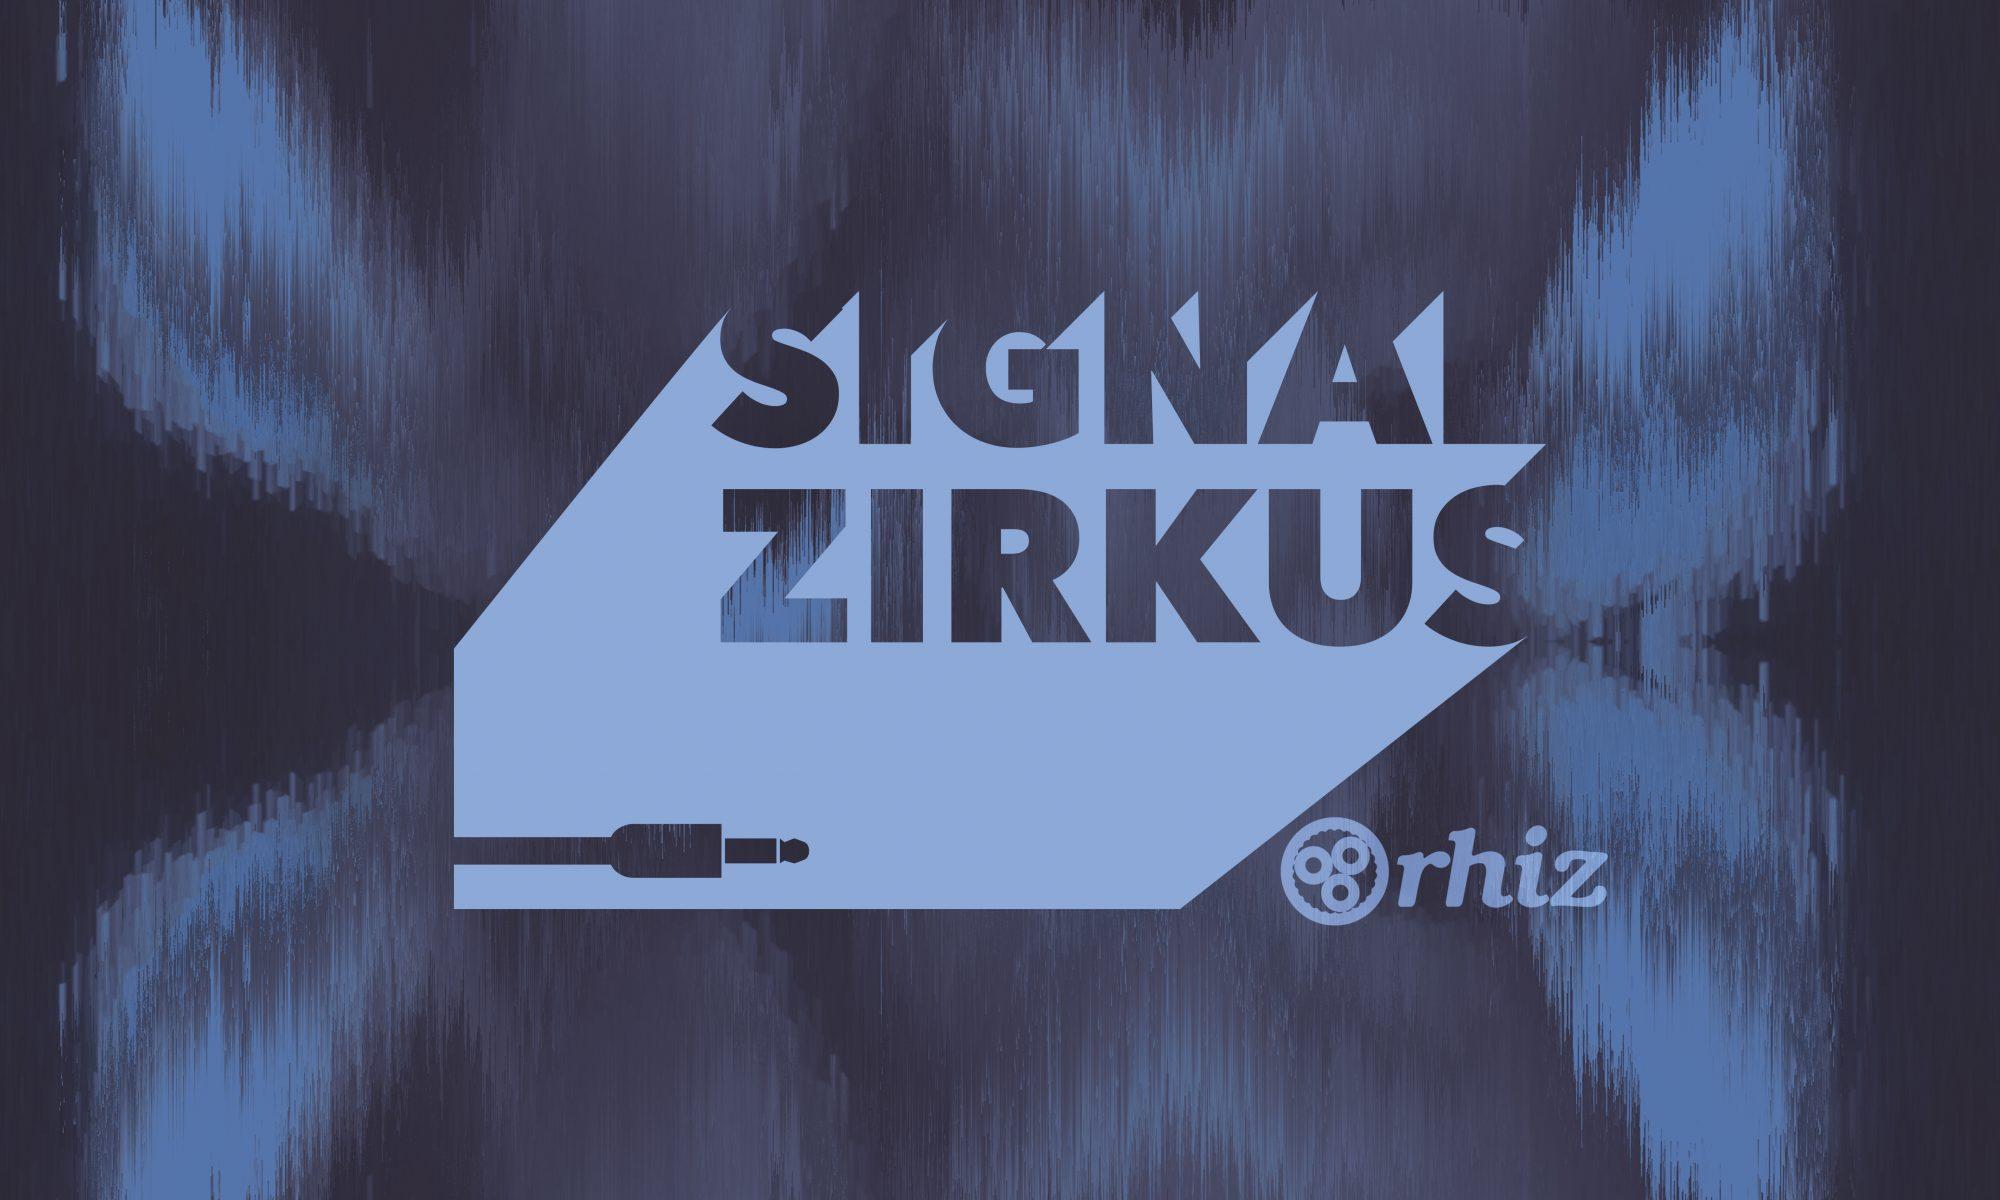 Signal_Zirkus_026_Eiszapfen_200113_m_L